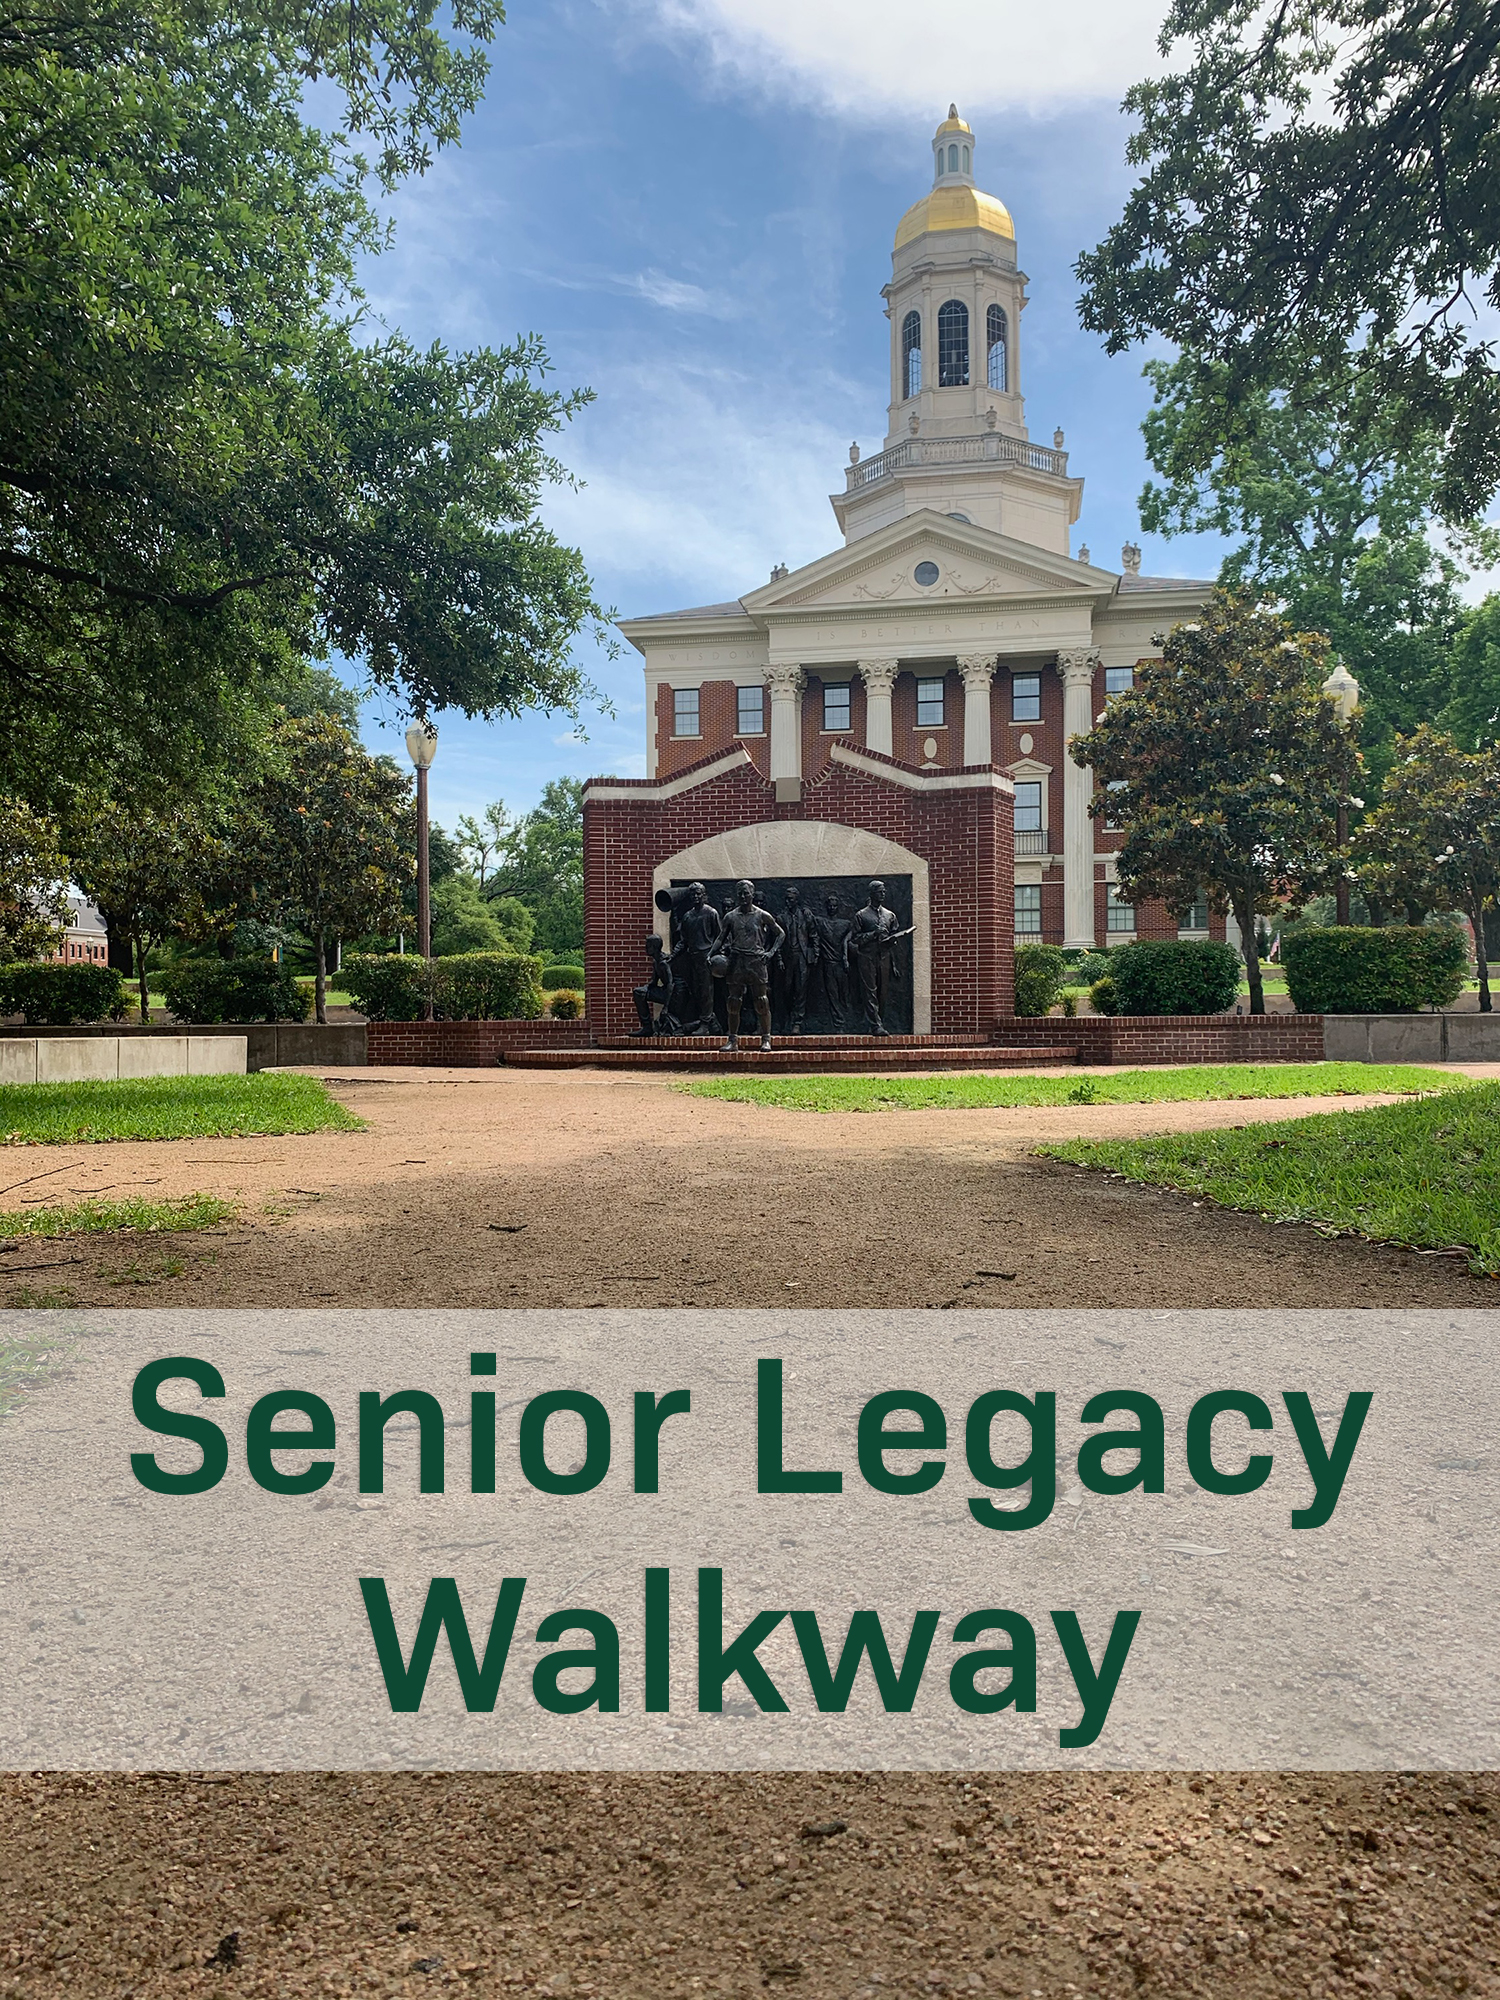 Senior Legacy Walkway